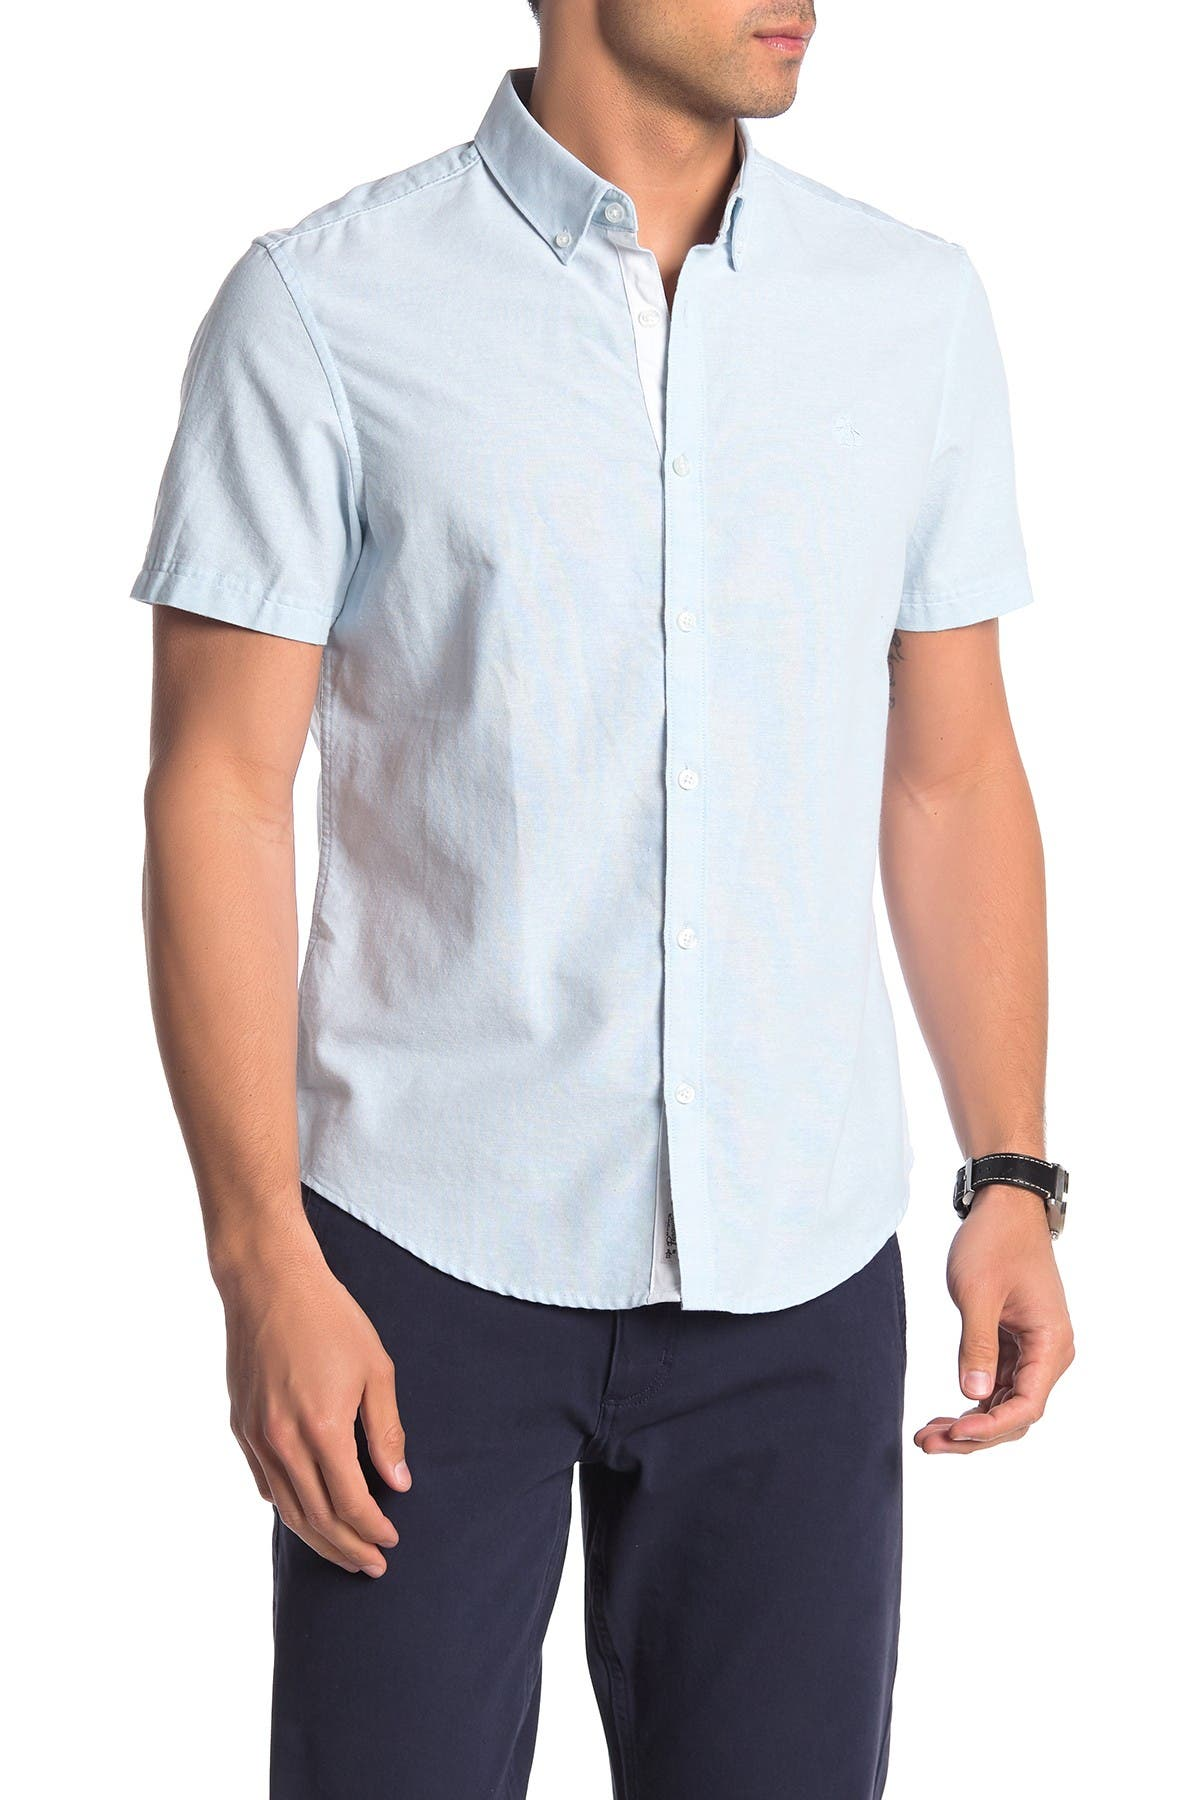 Image of Original Penguin Short Sleeve Woven Trim Fit Oxford Shirt